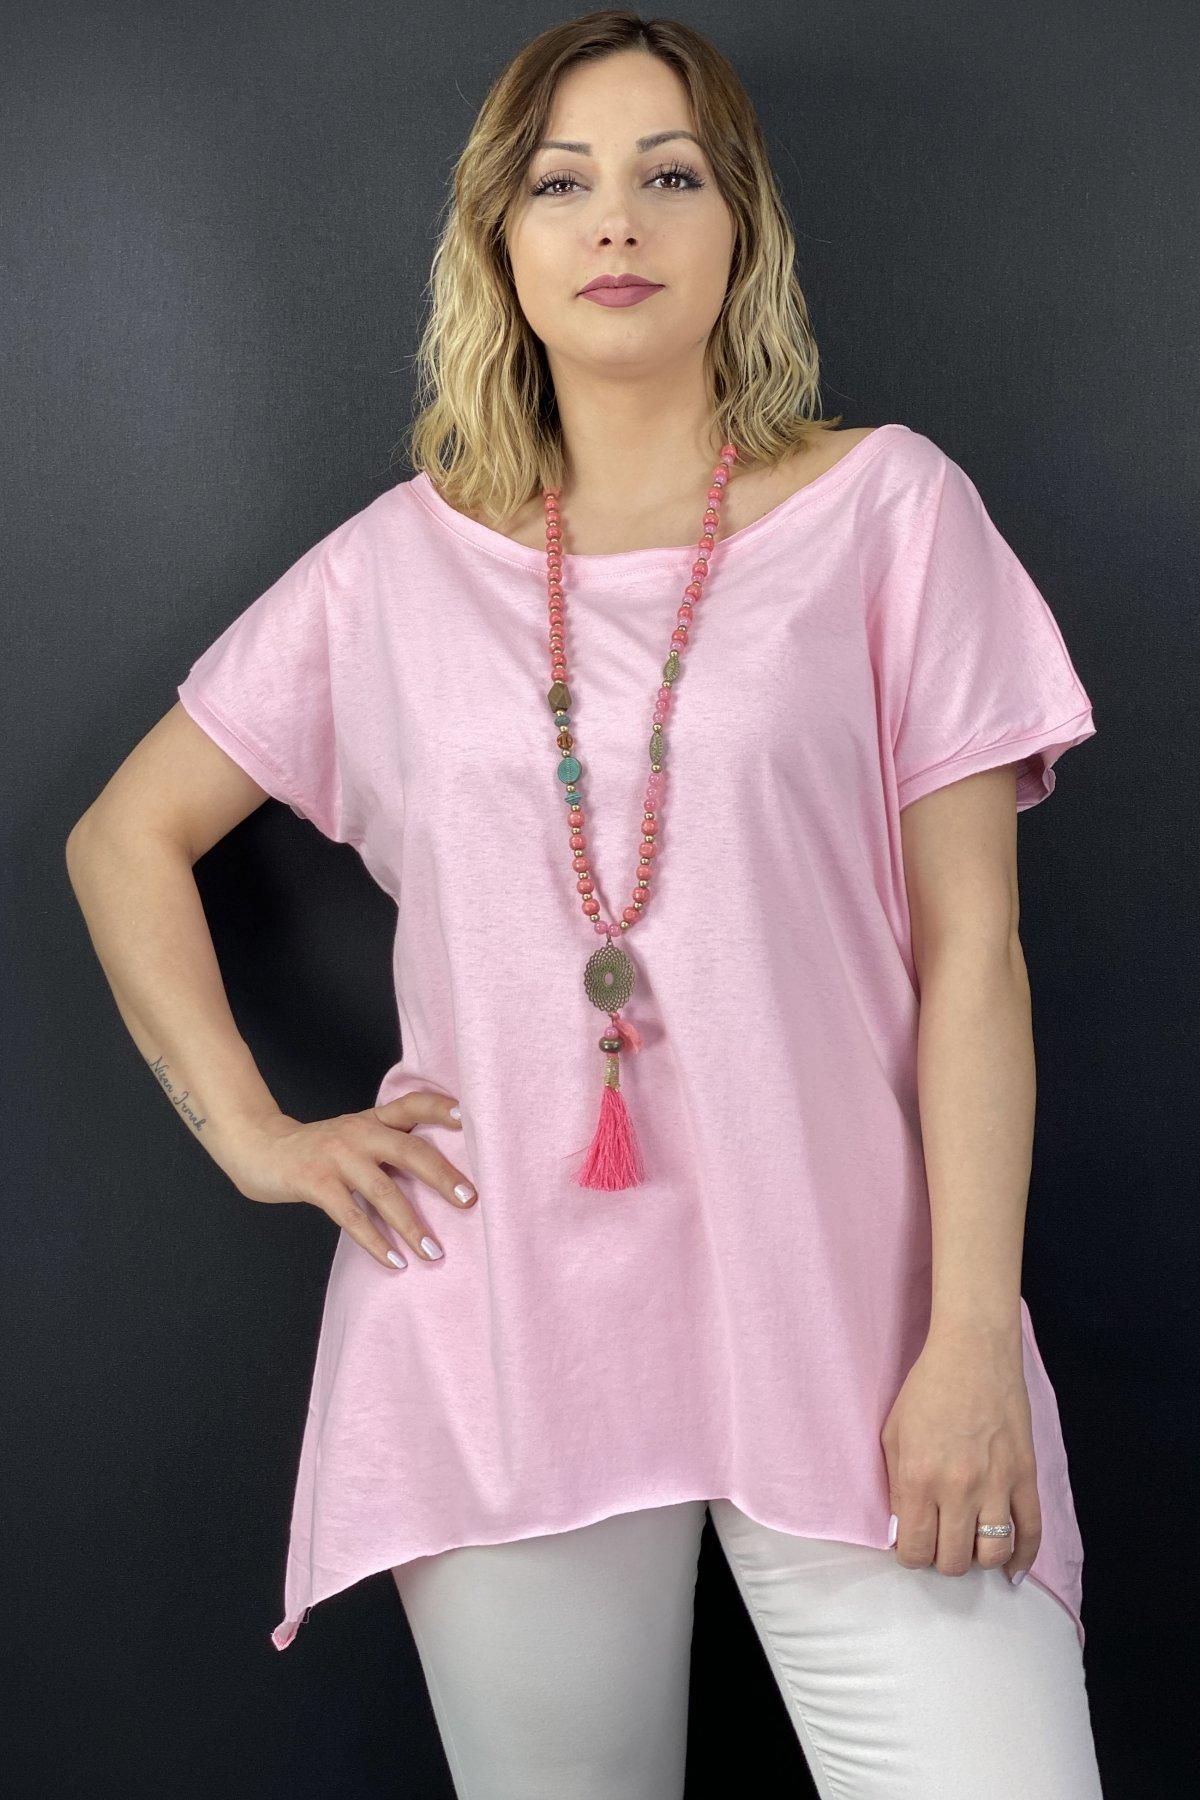 https://resim.chicbag.com.tr/p000497/apm/yakasi-ve-etegi-kesik-etek-ucu-asimetrik-t-shirt-0151342fdce8.jpg